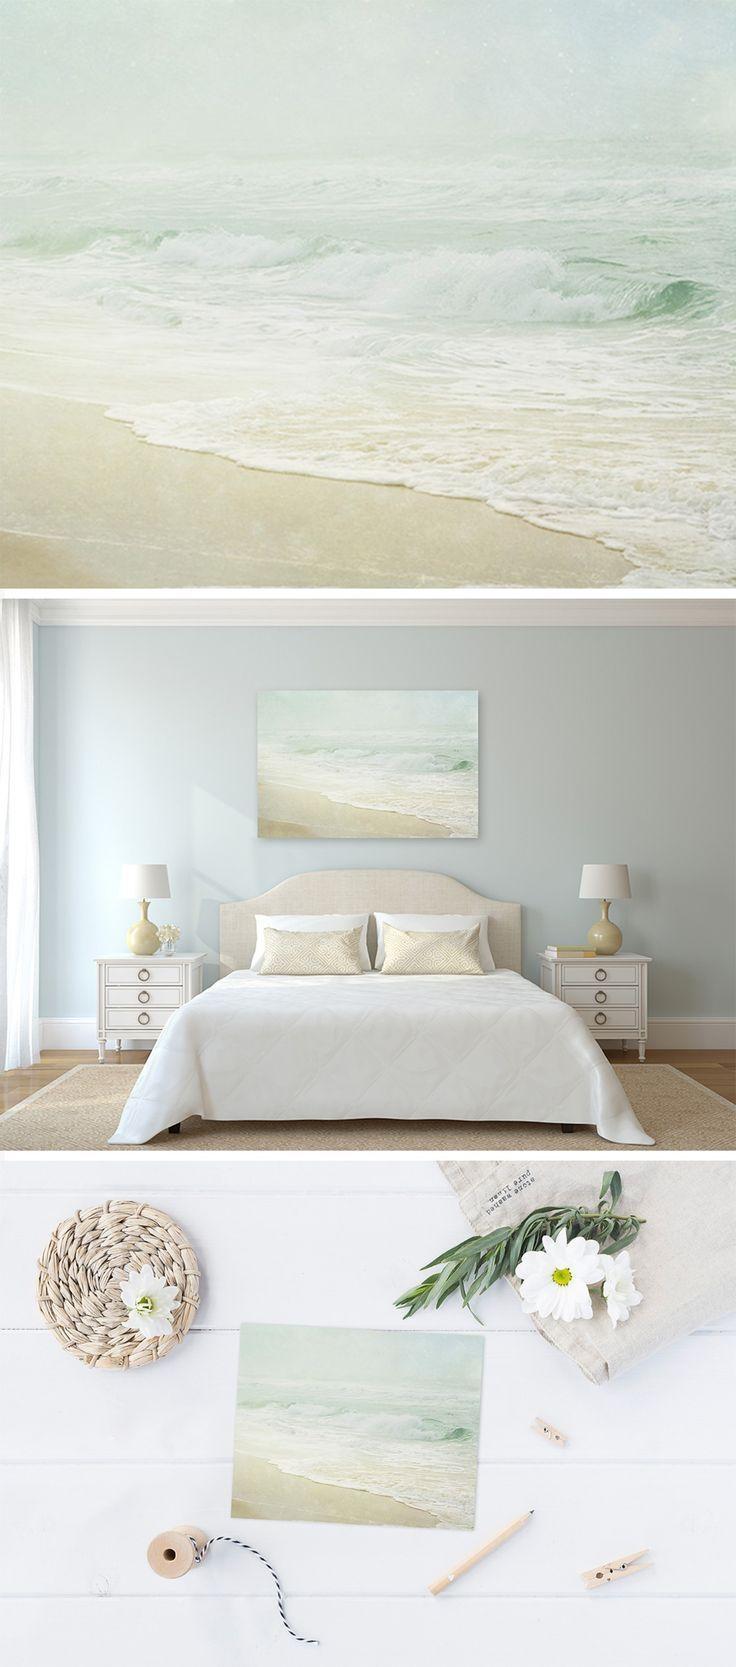 Best 25+ Coastal Wall Art Ideas On Pinterest   Coastal Inspired Regarding Beach Theme Wall Art (Image 11 of 20)